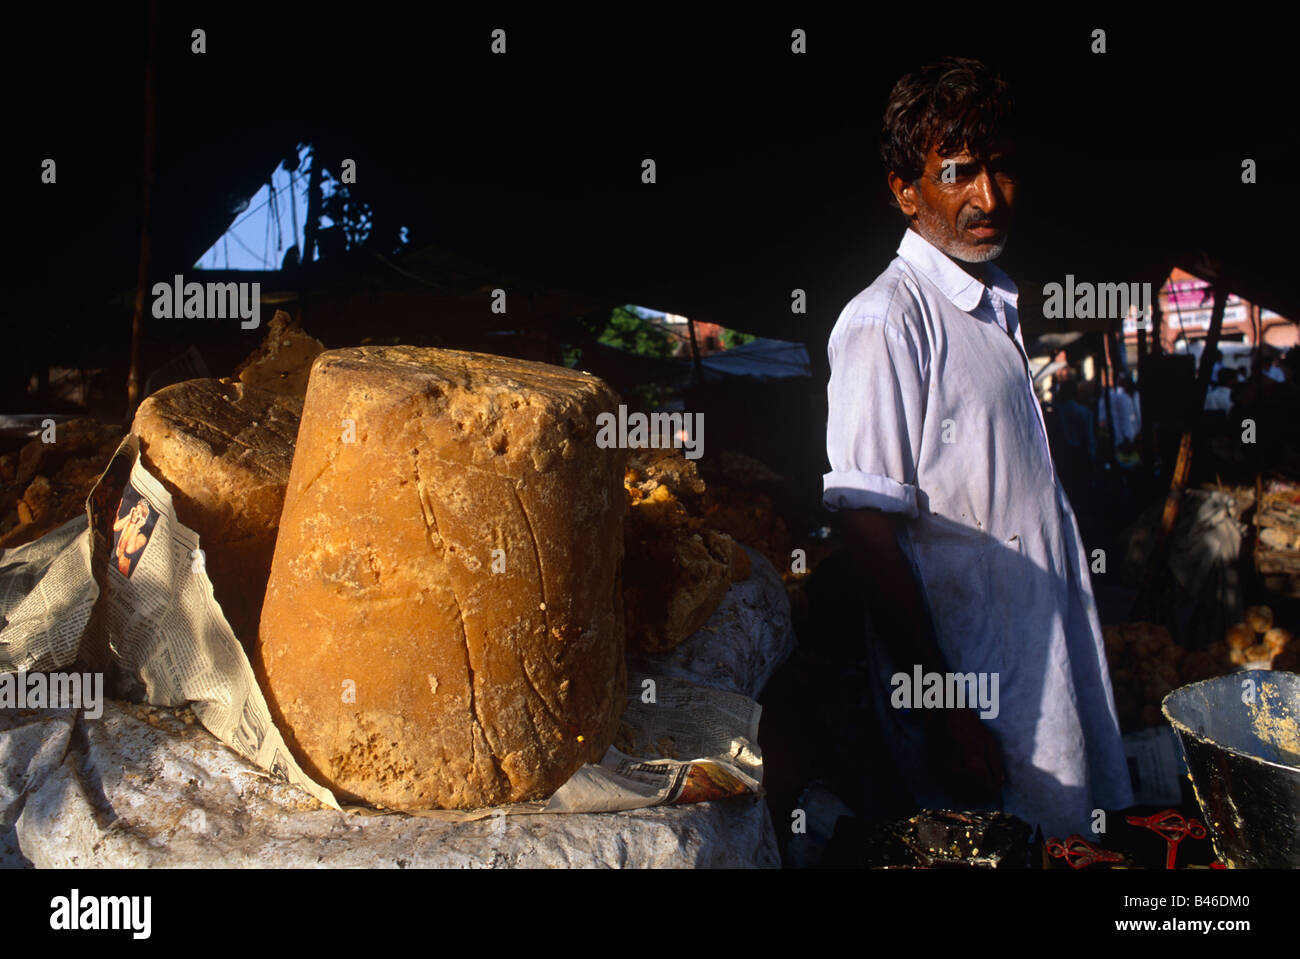 Foodstall Awning Man Standing By Pillar Of Brown Sugar Palm JAIPUR RAJASTHAN INDIA